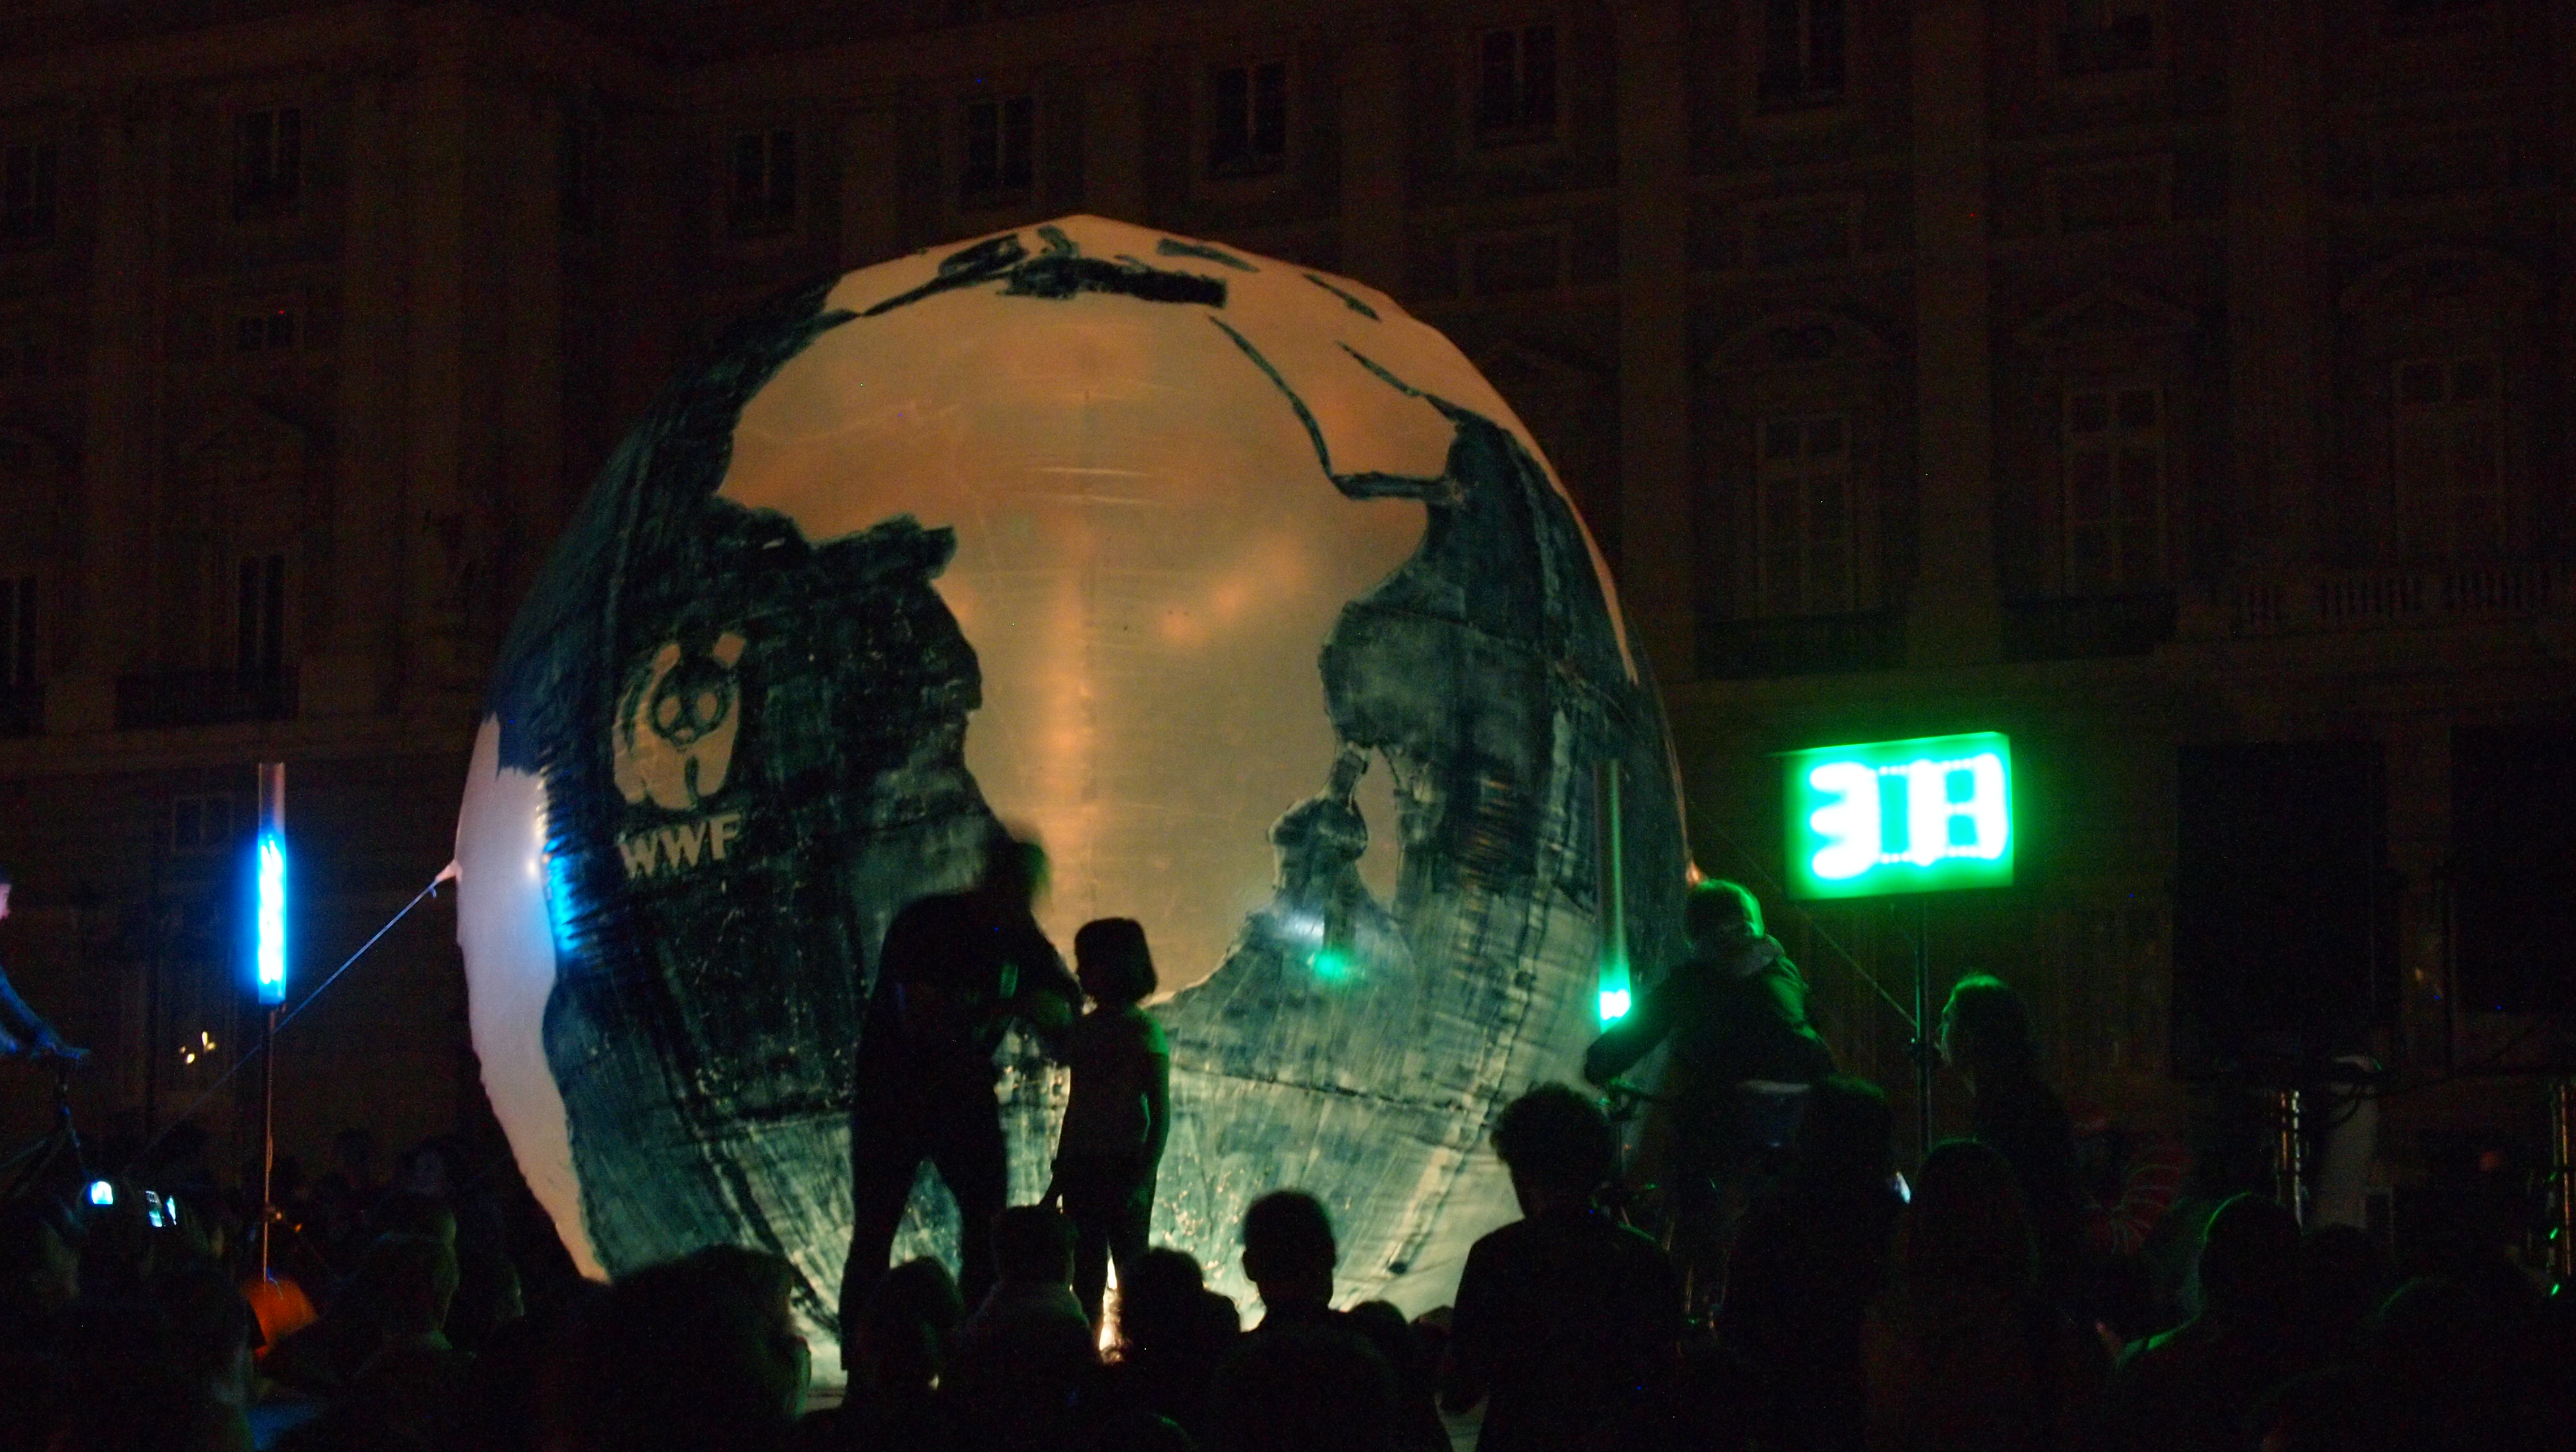 WWF · Hora del Planeta 2015